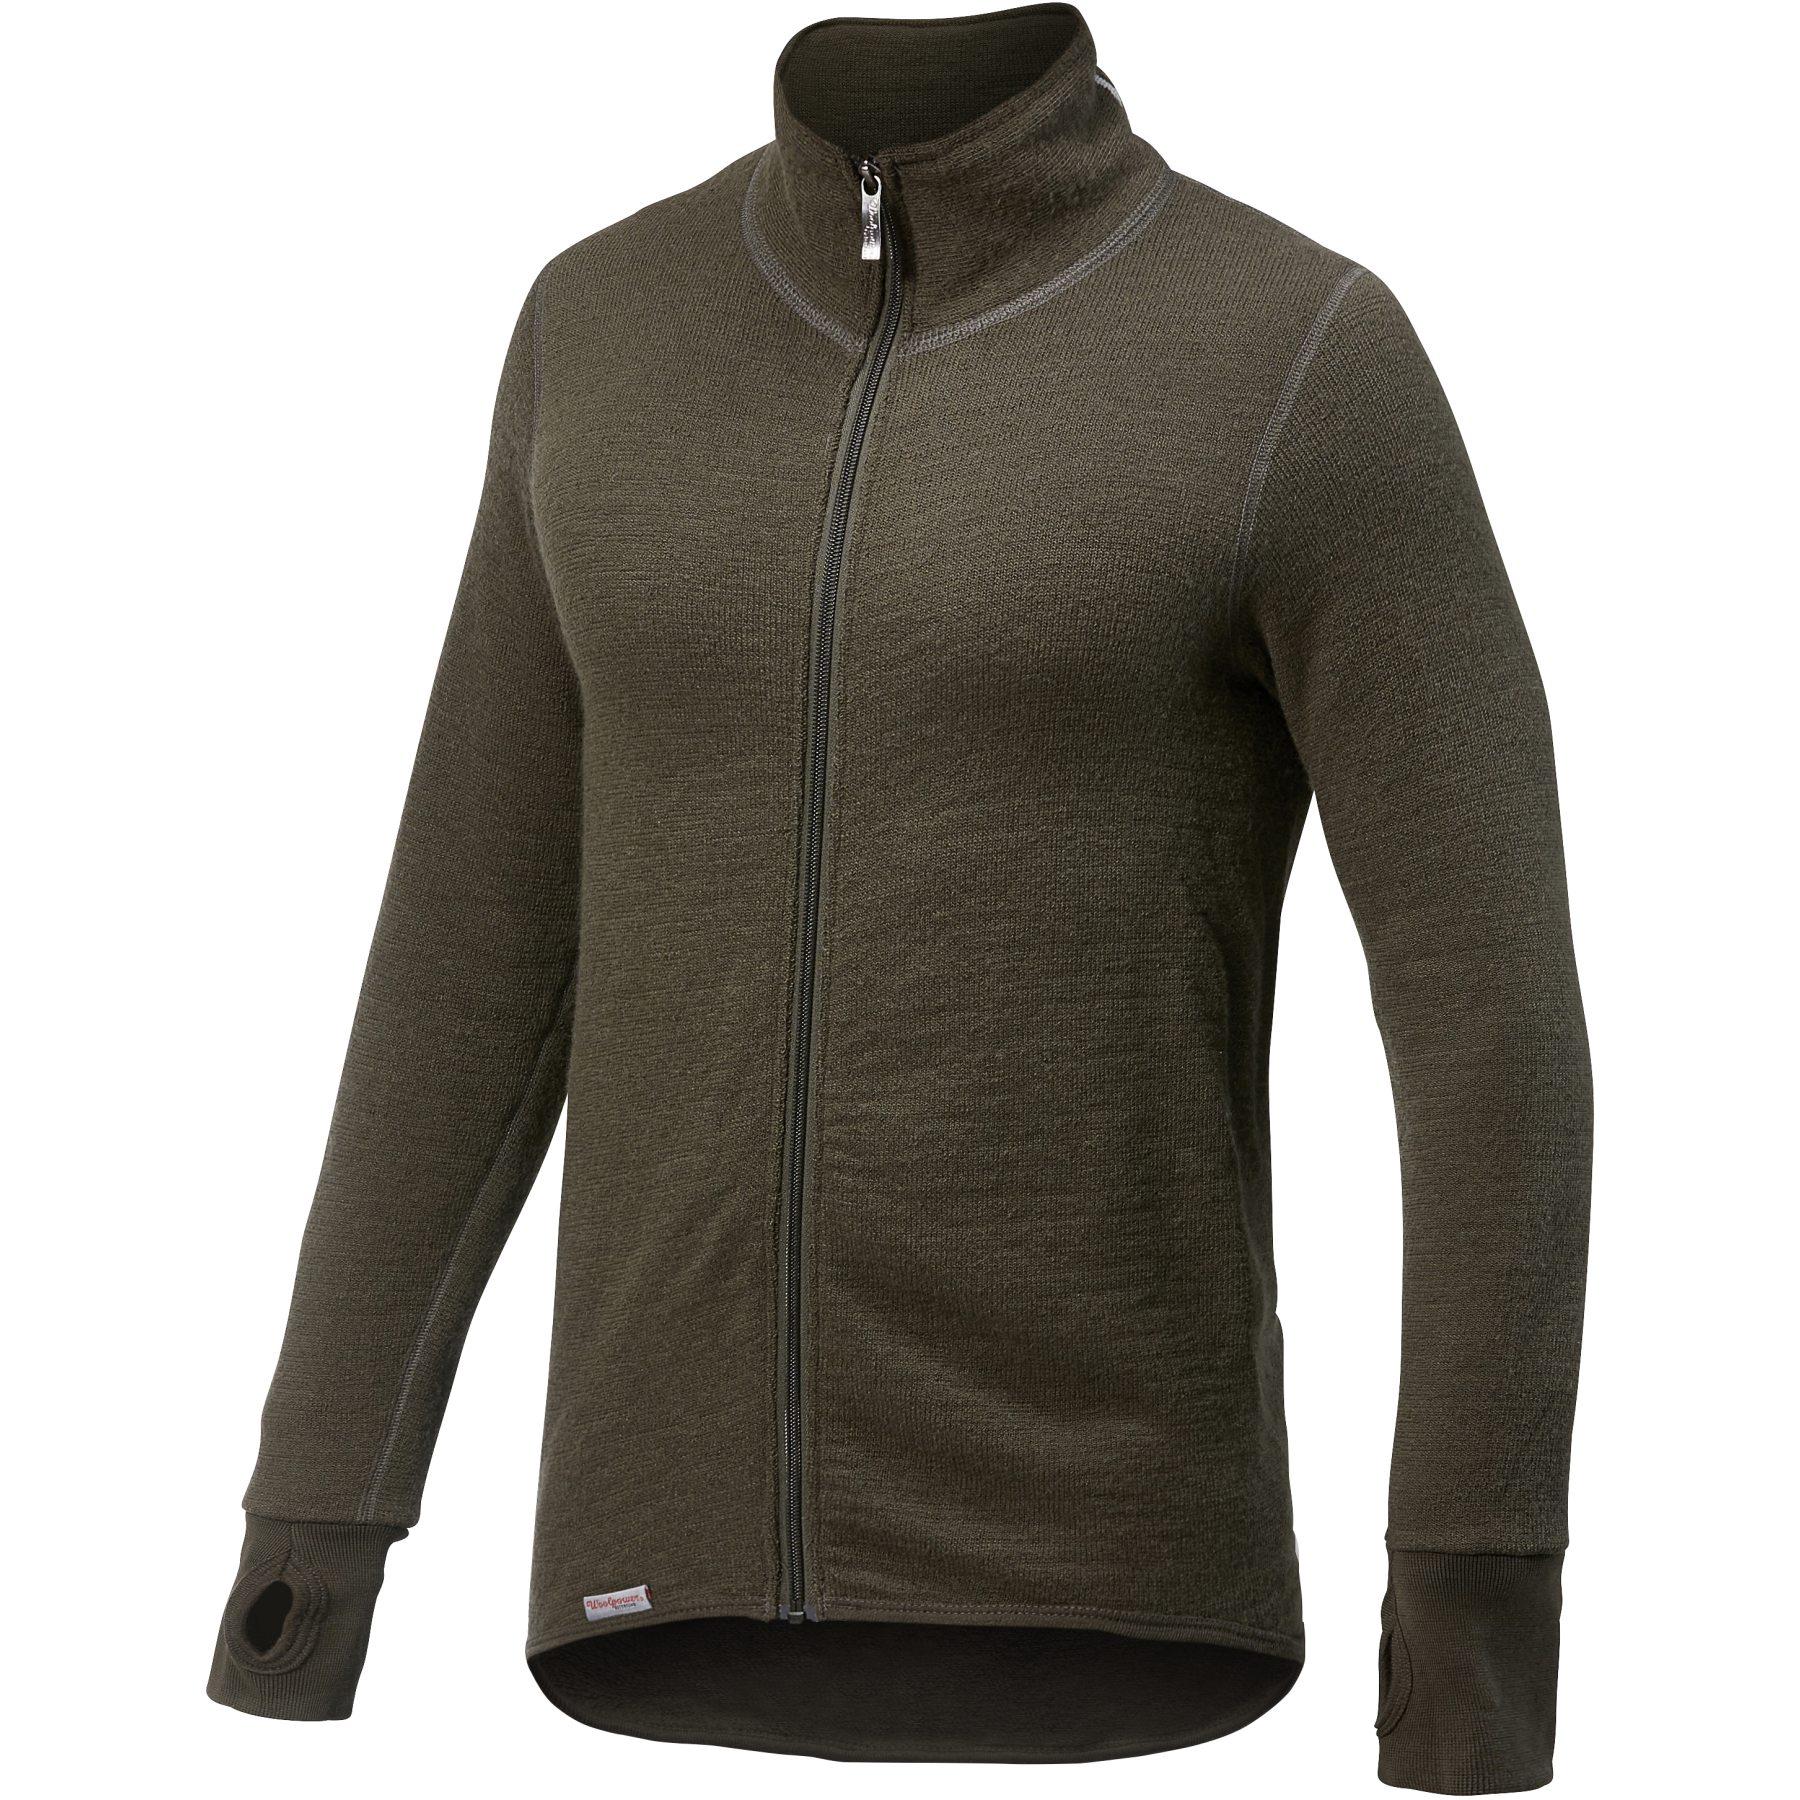 Woolpower Full Zip Jacket 400 - pine green